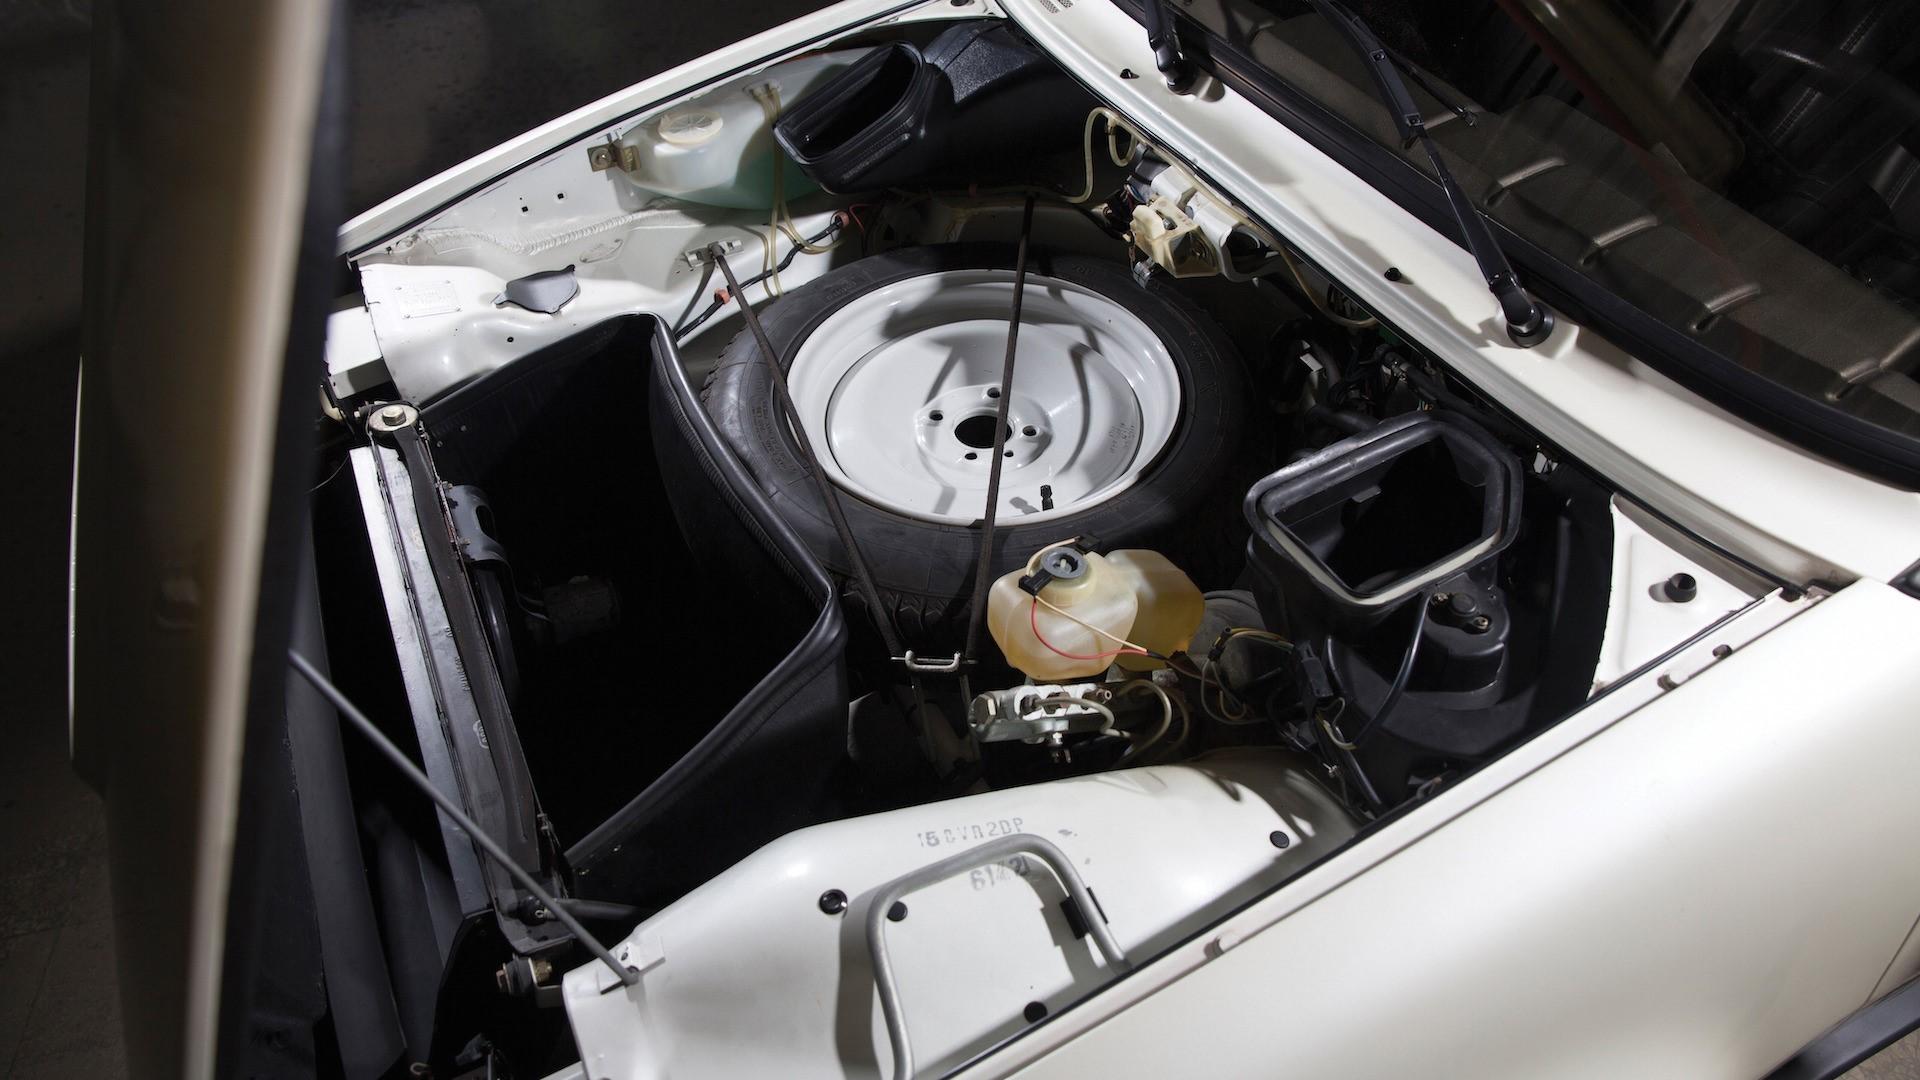 1983-renault-5-turbo-ii-auction (23)